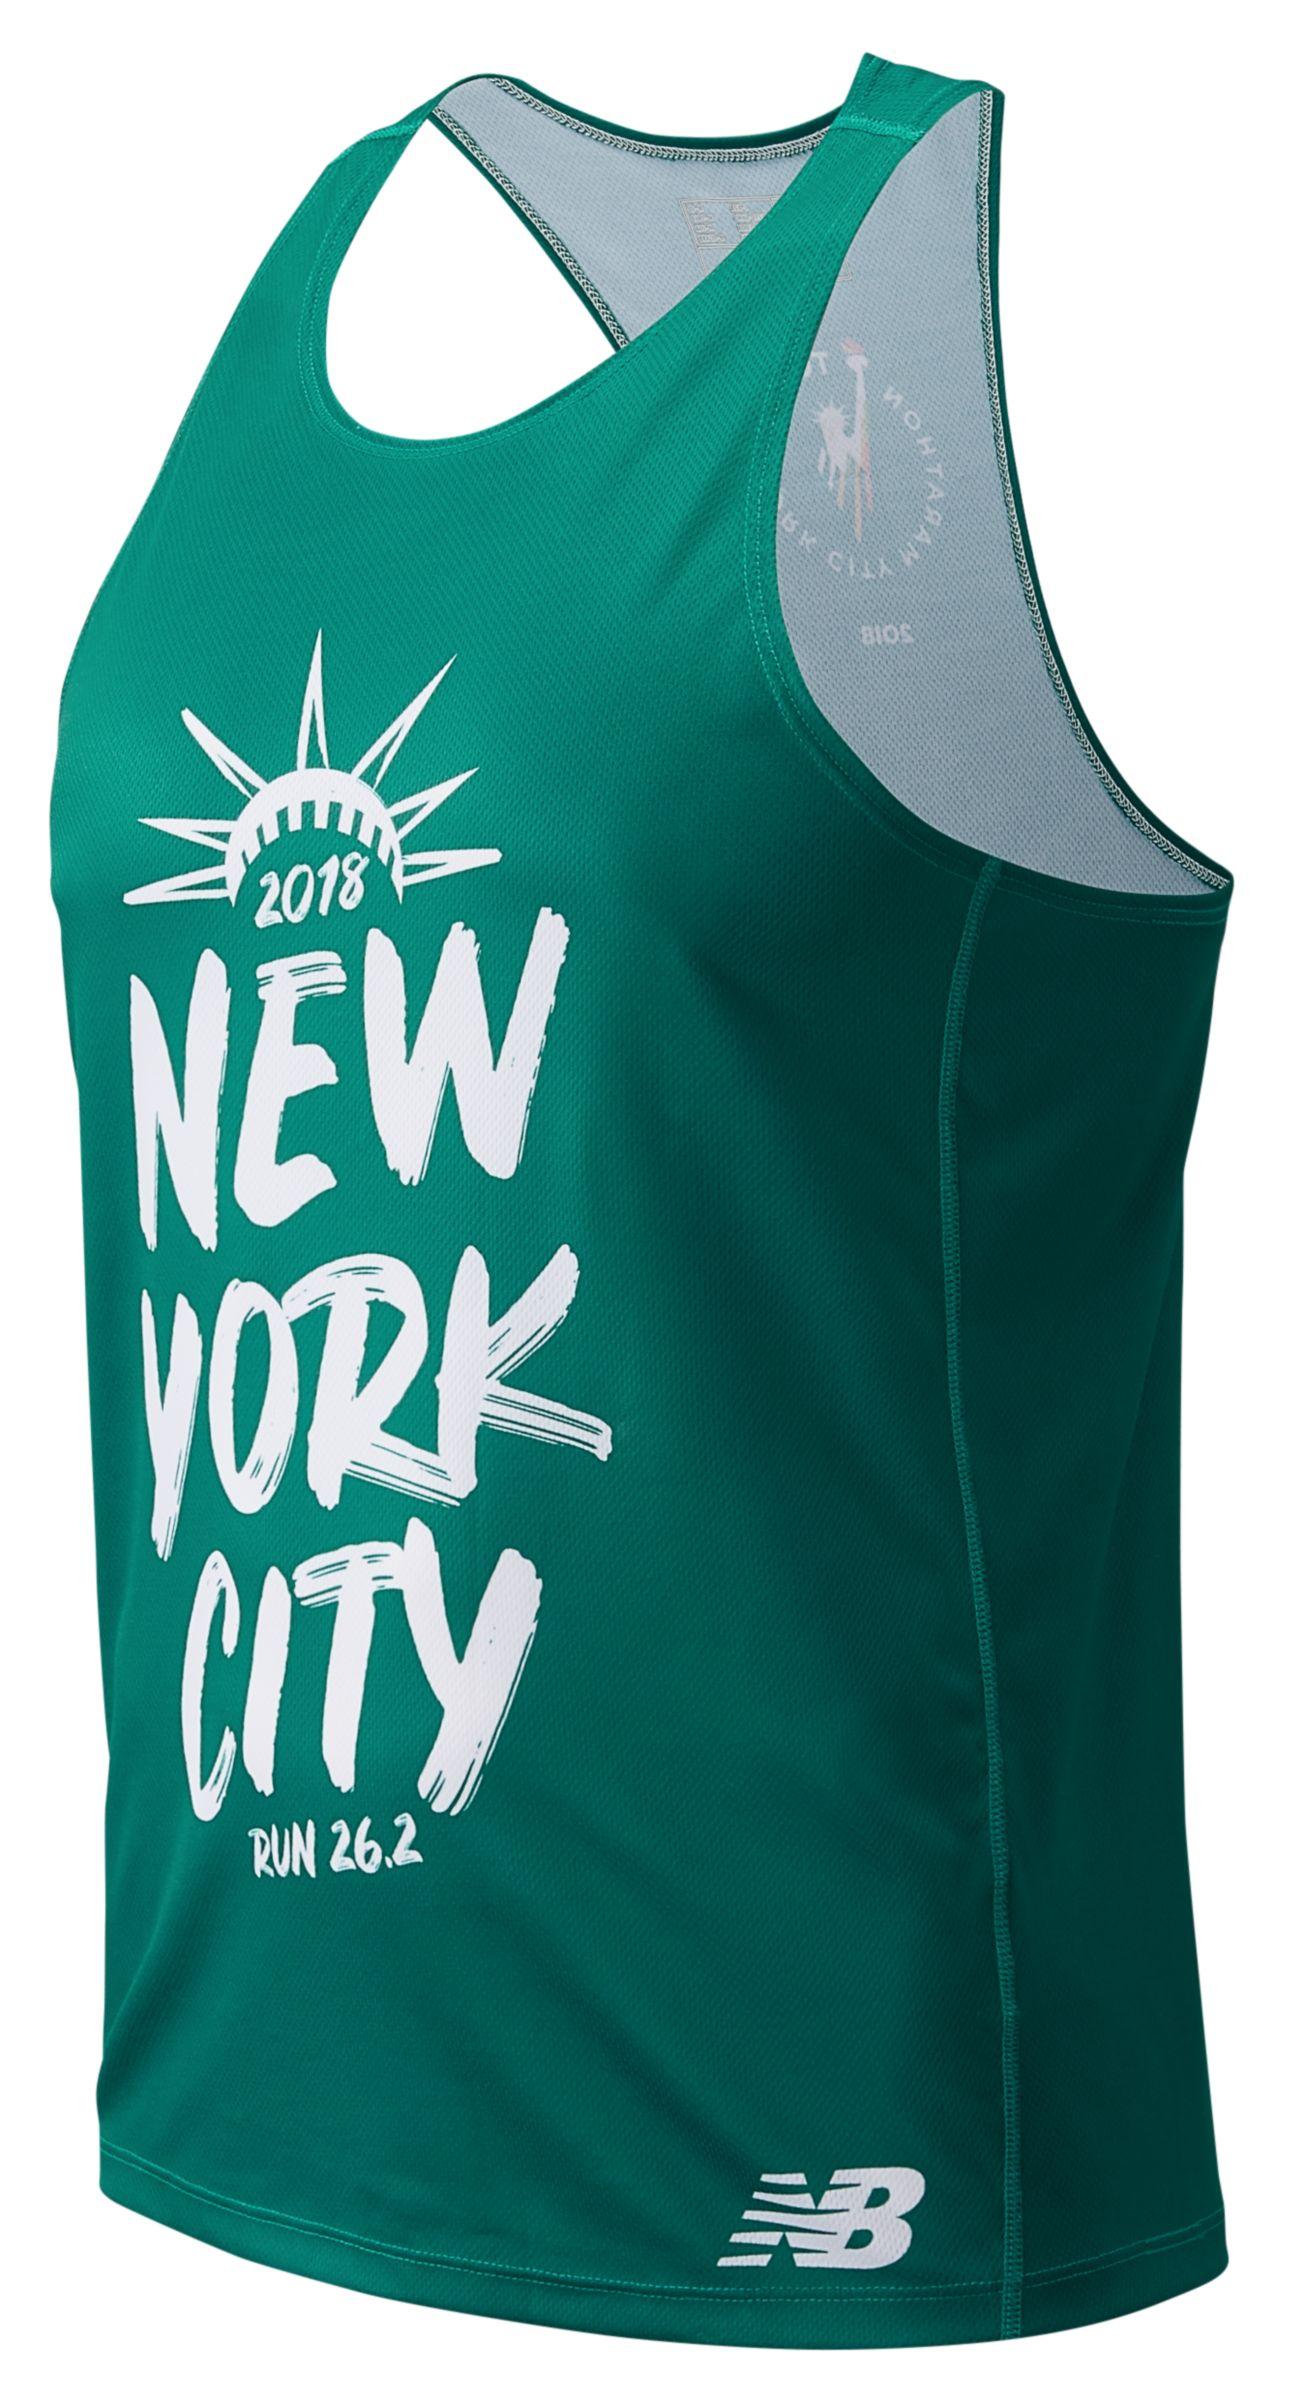 NEW New Balance TCS New York City Marathon 2018 Singlet Tank Top ...